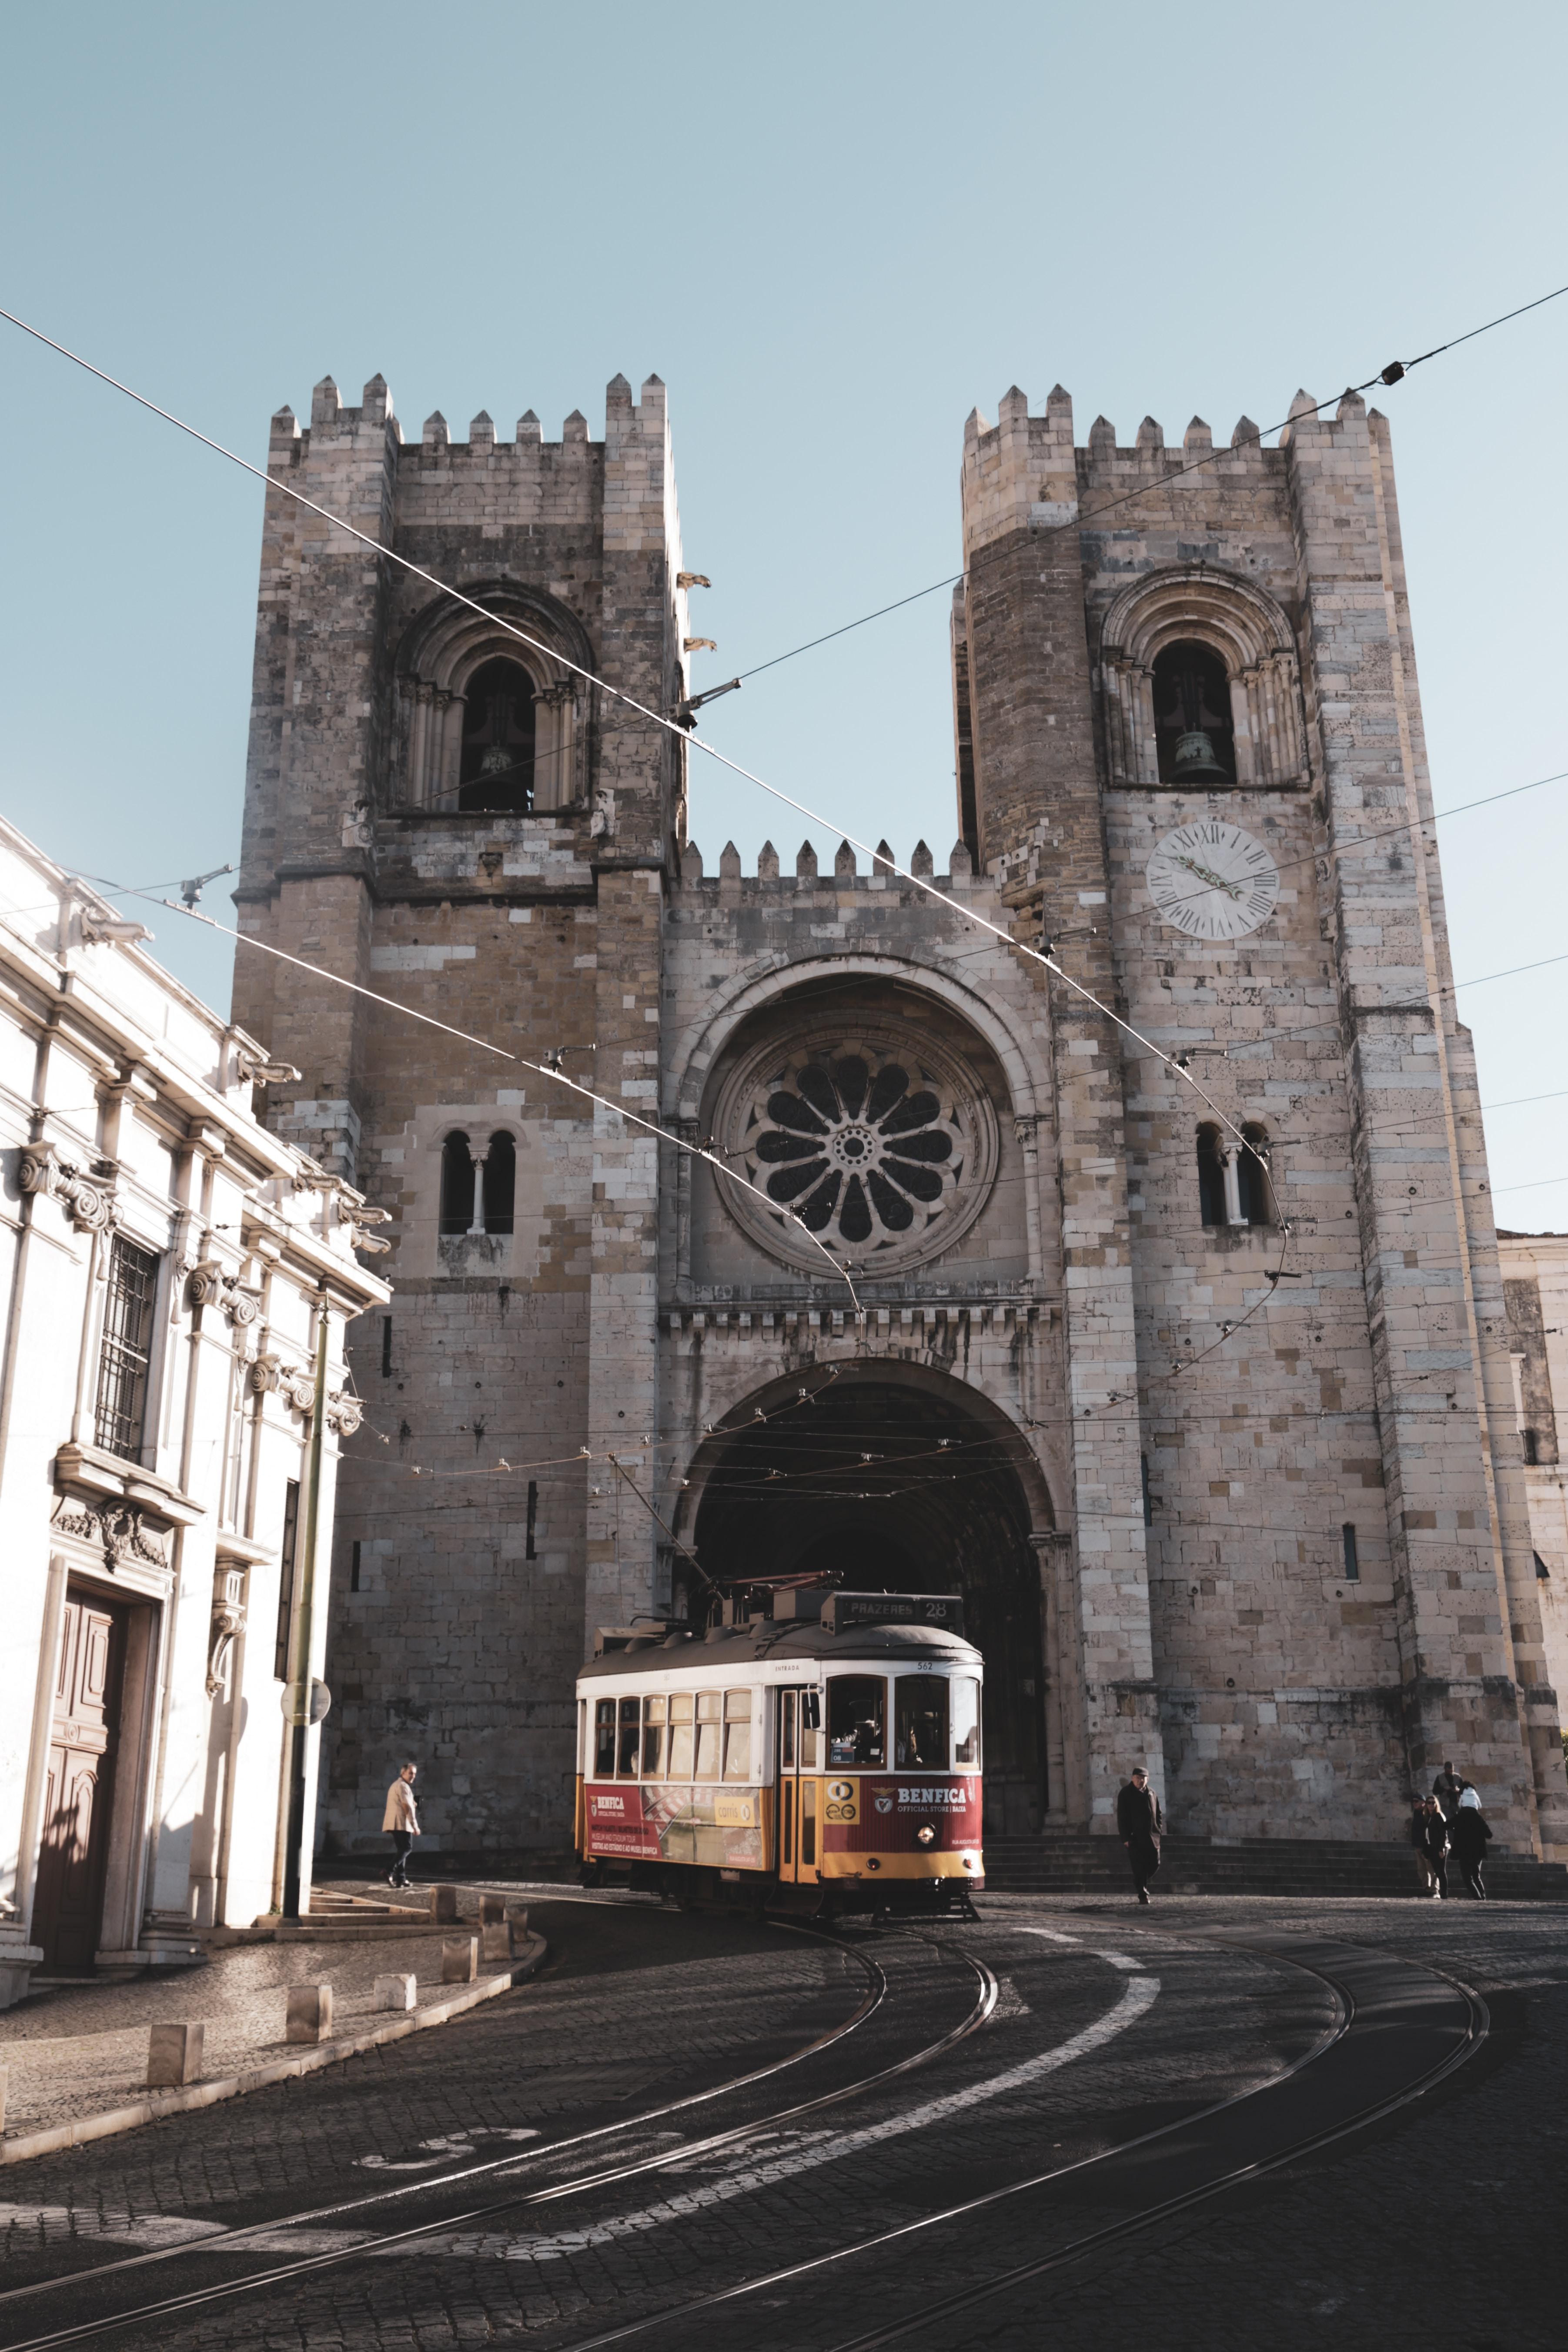 graphic node qOTyvyjVyoY unsplash - Португалия - страна мечты!